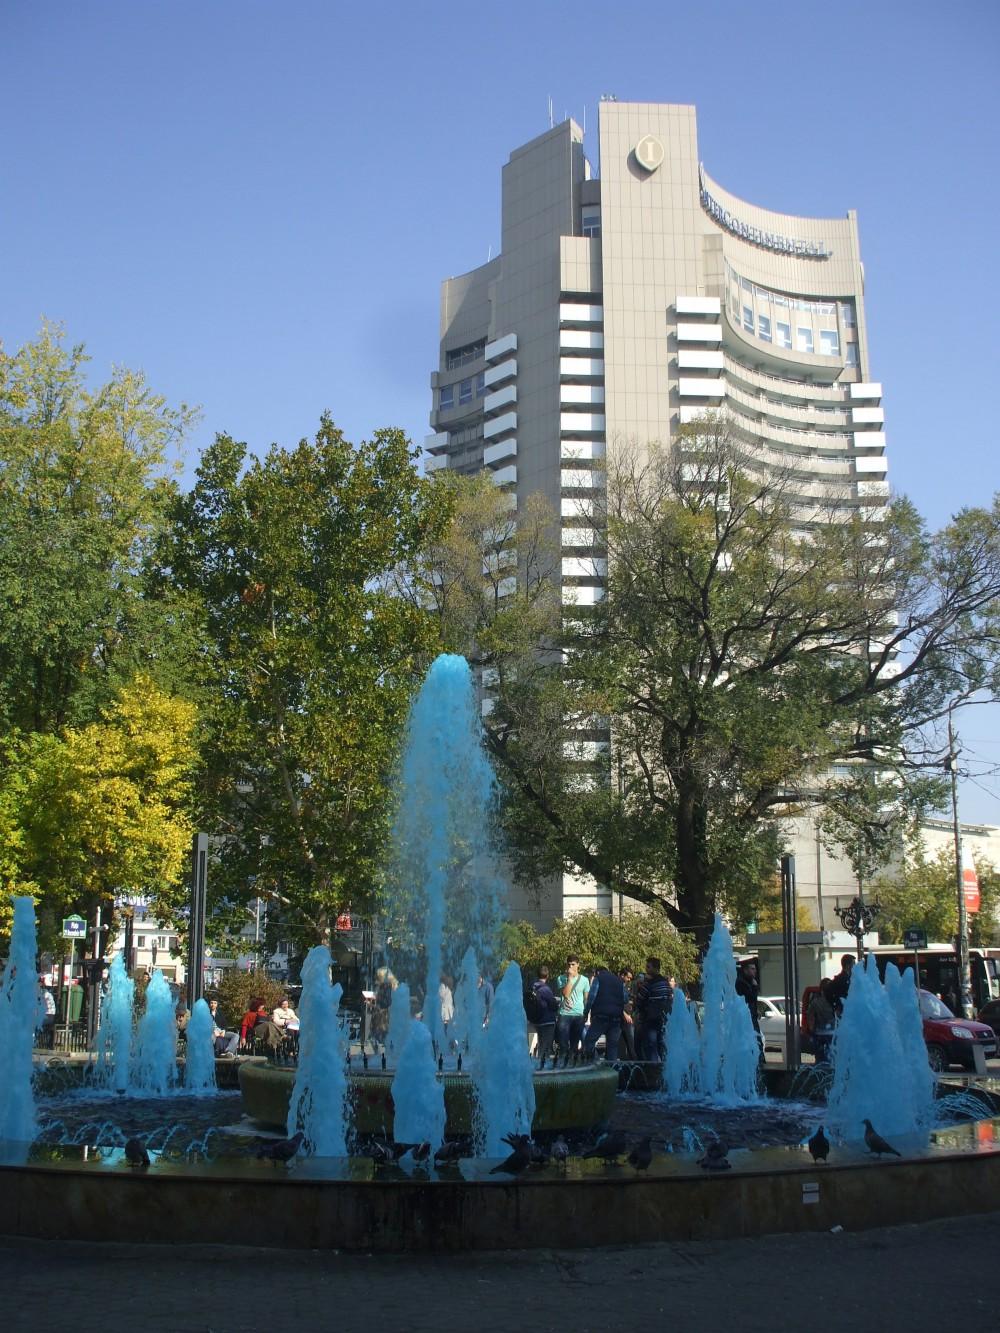 Intercontinental Hotel & University Fountain in Bucharest